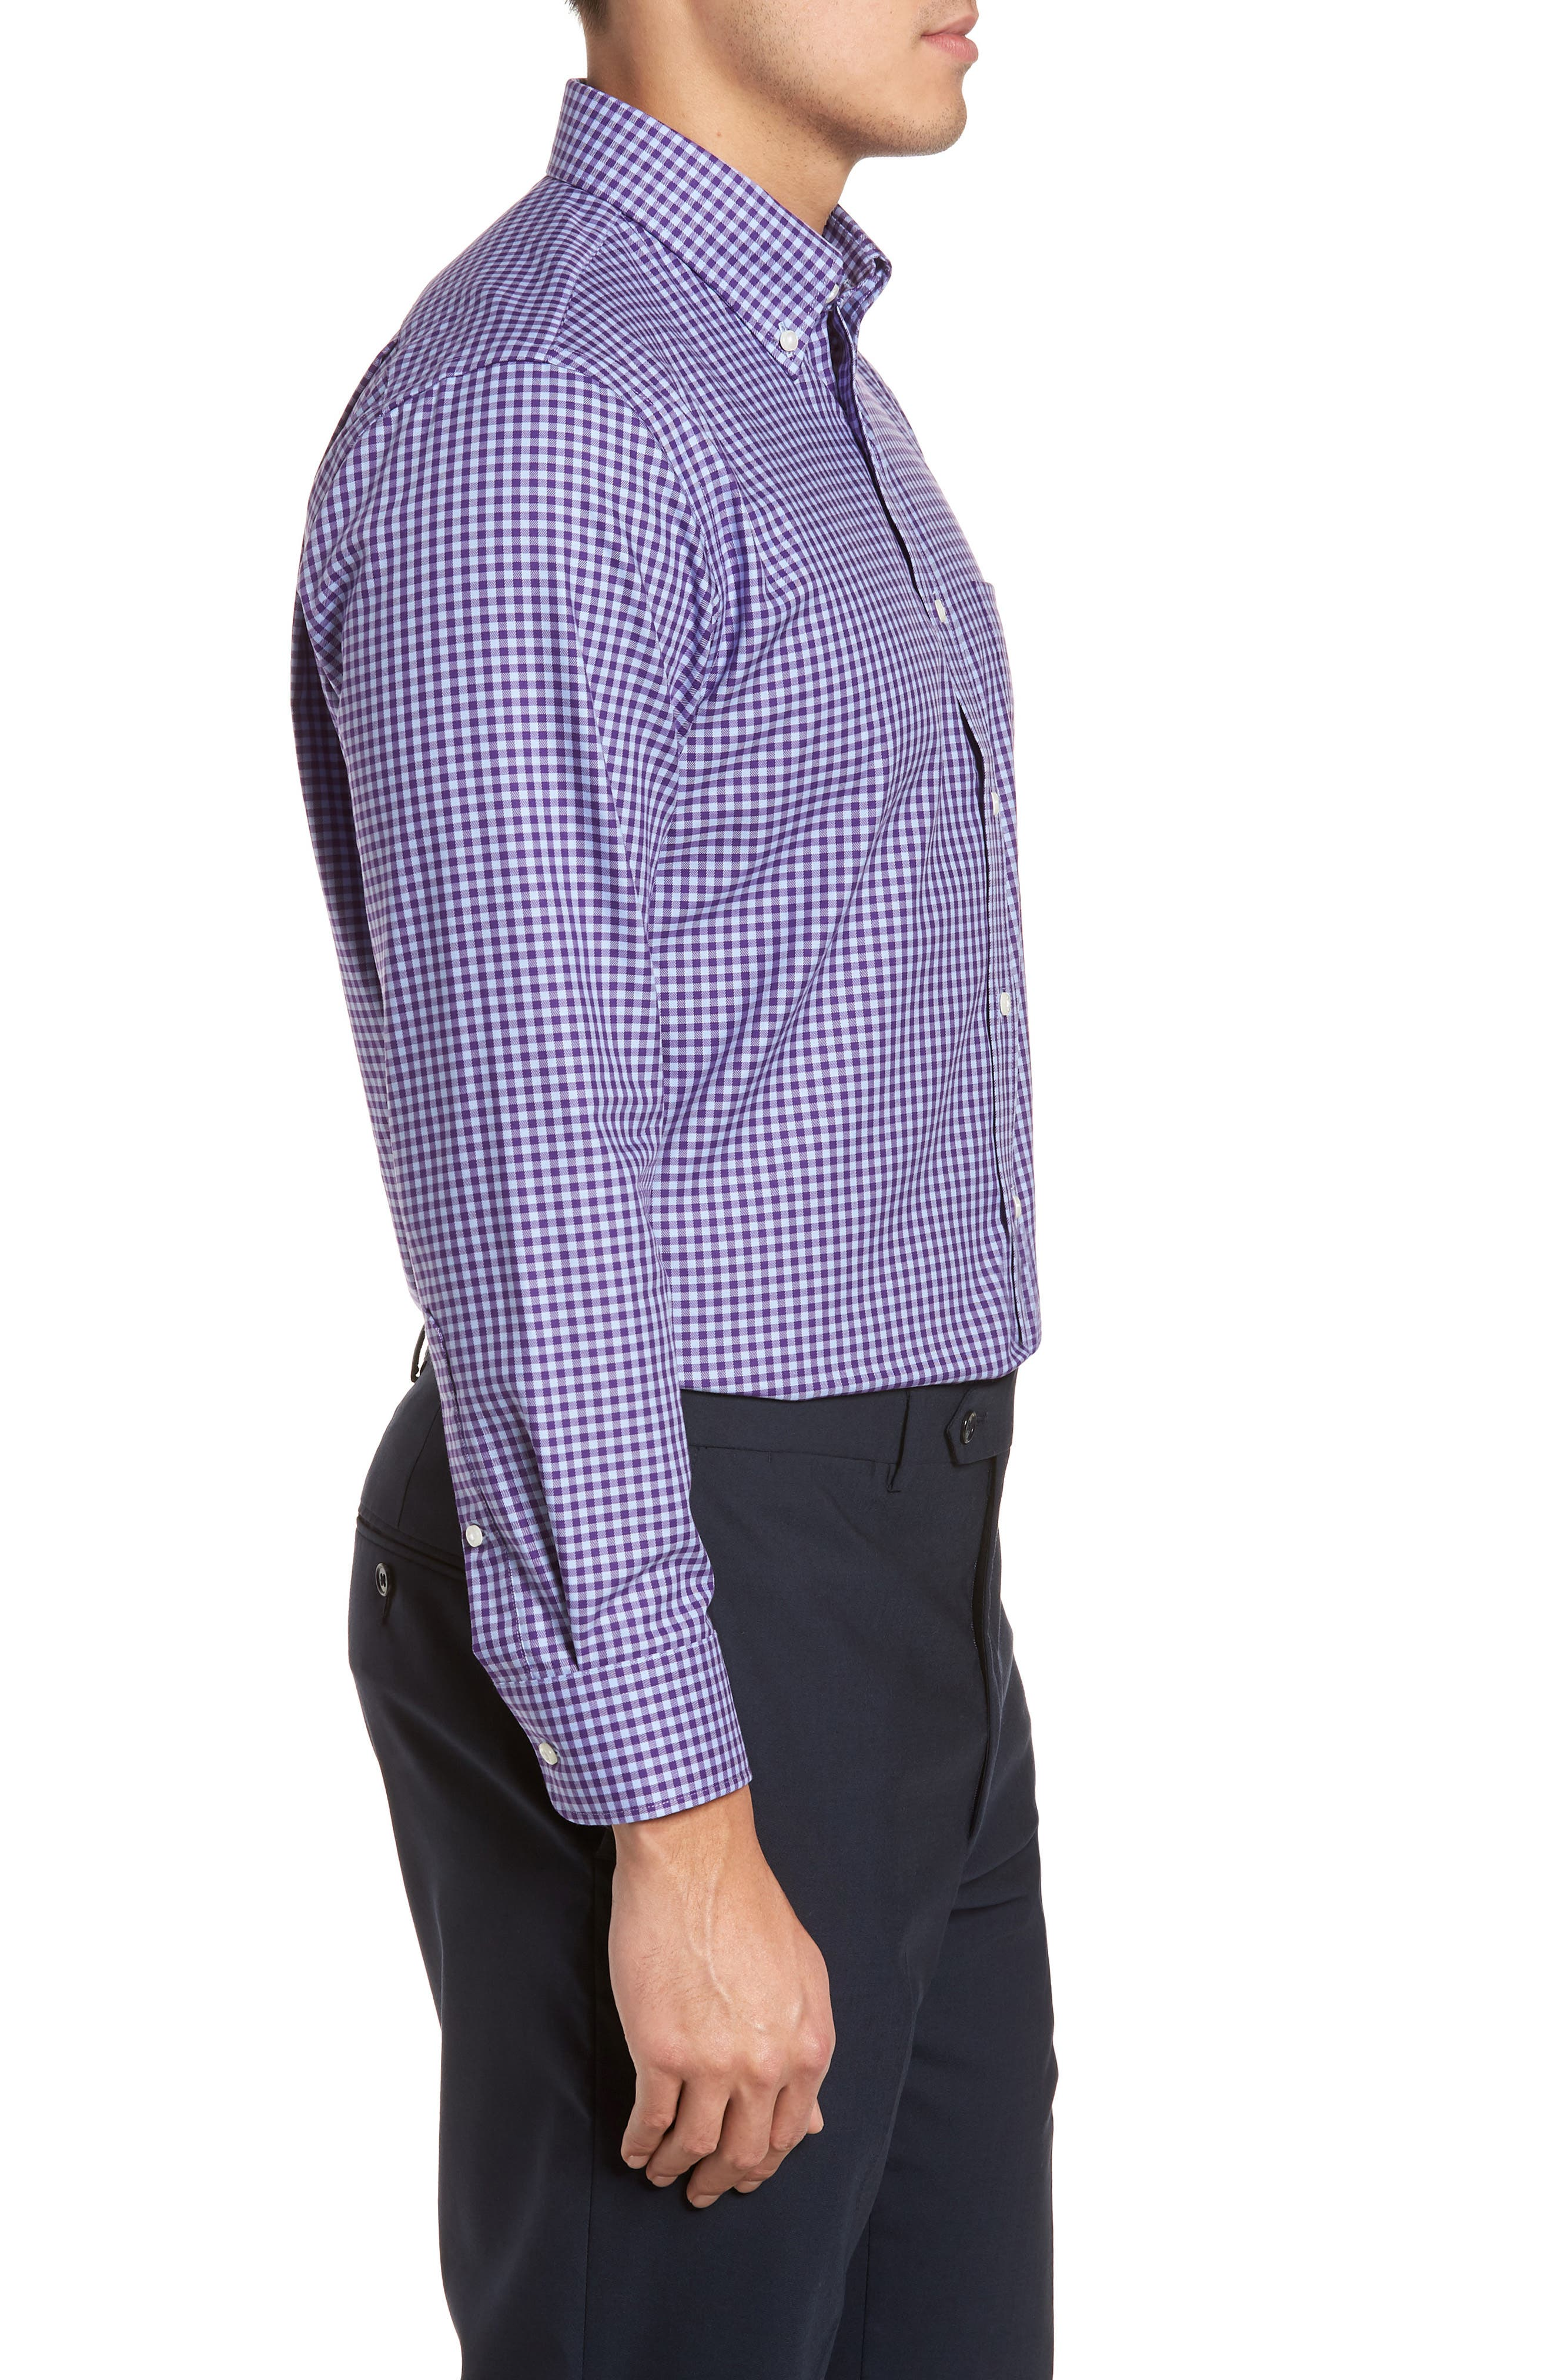 Alternate Image 3  - Nordstrom Men's Shop Trim Fit Non-Iron Gingham Dress Shirt